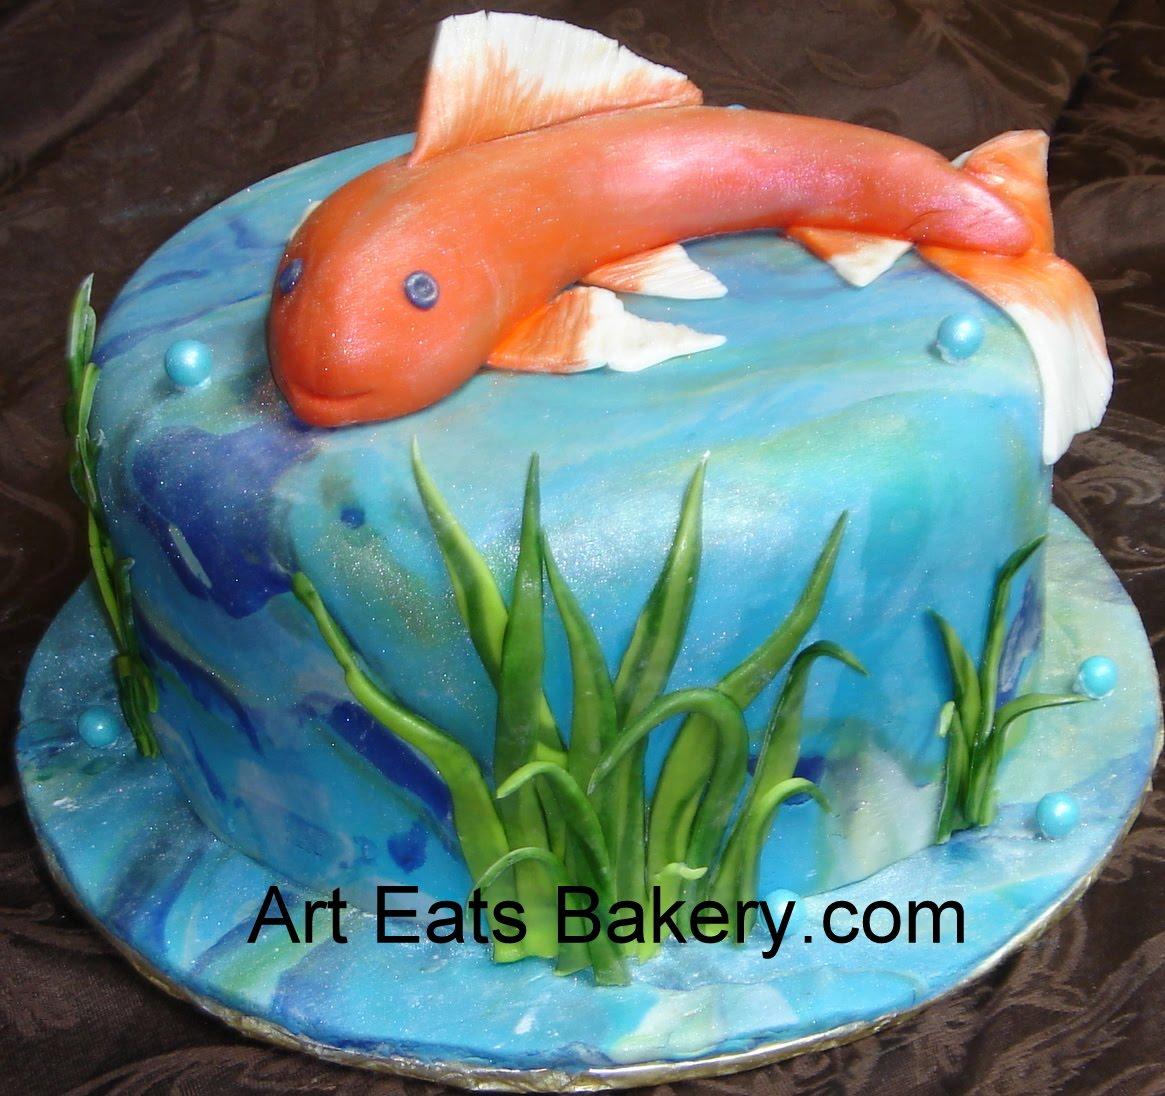 Koi pond custom unique fondant birthday cake with fish for Fish cake design